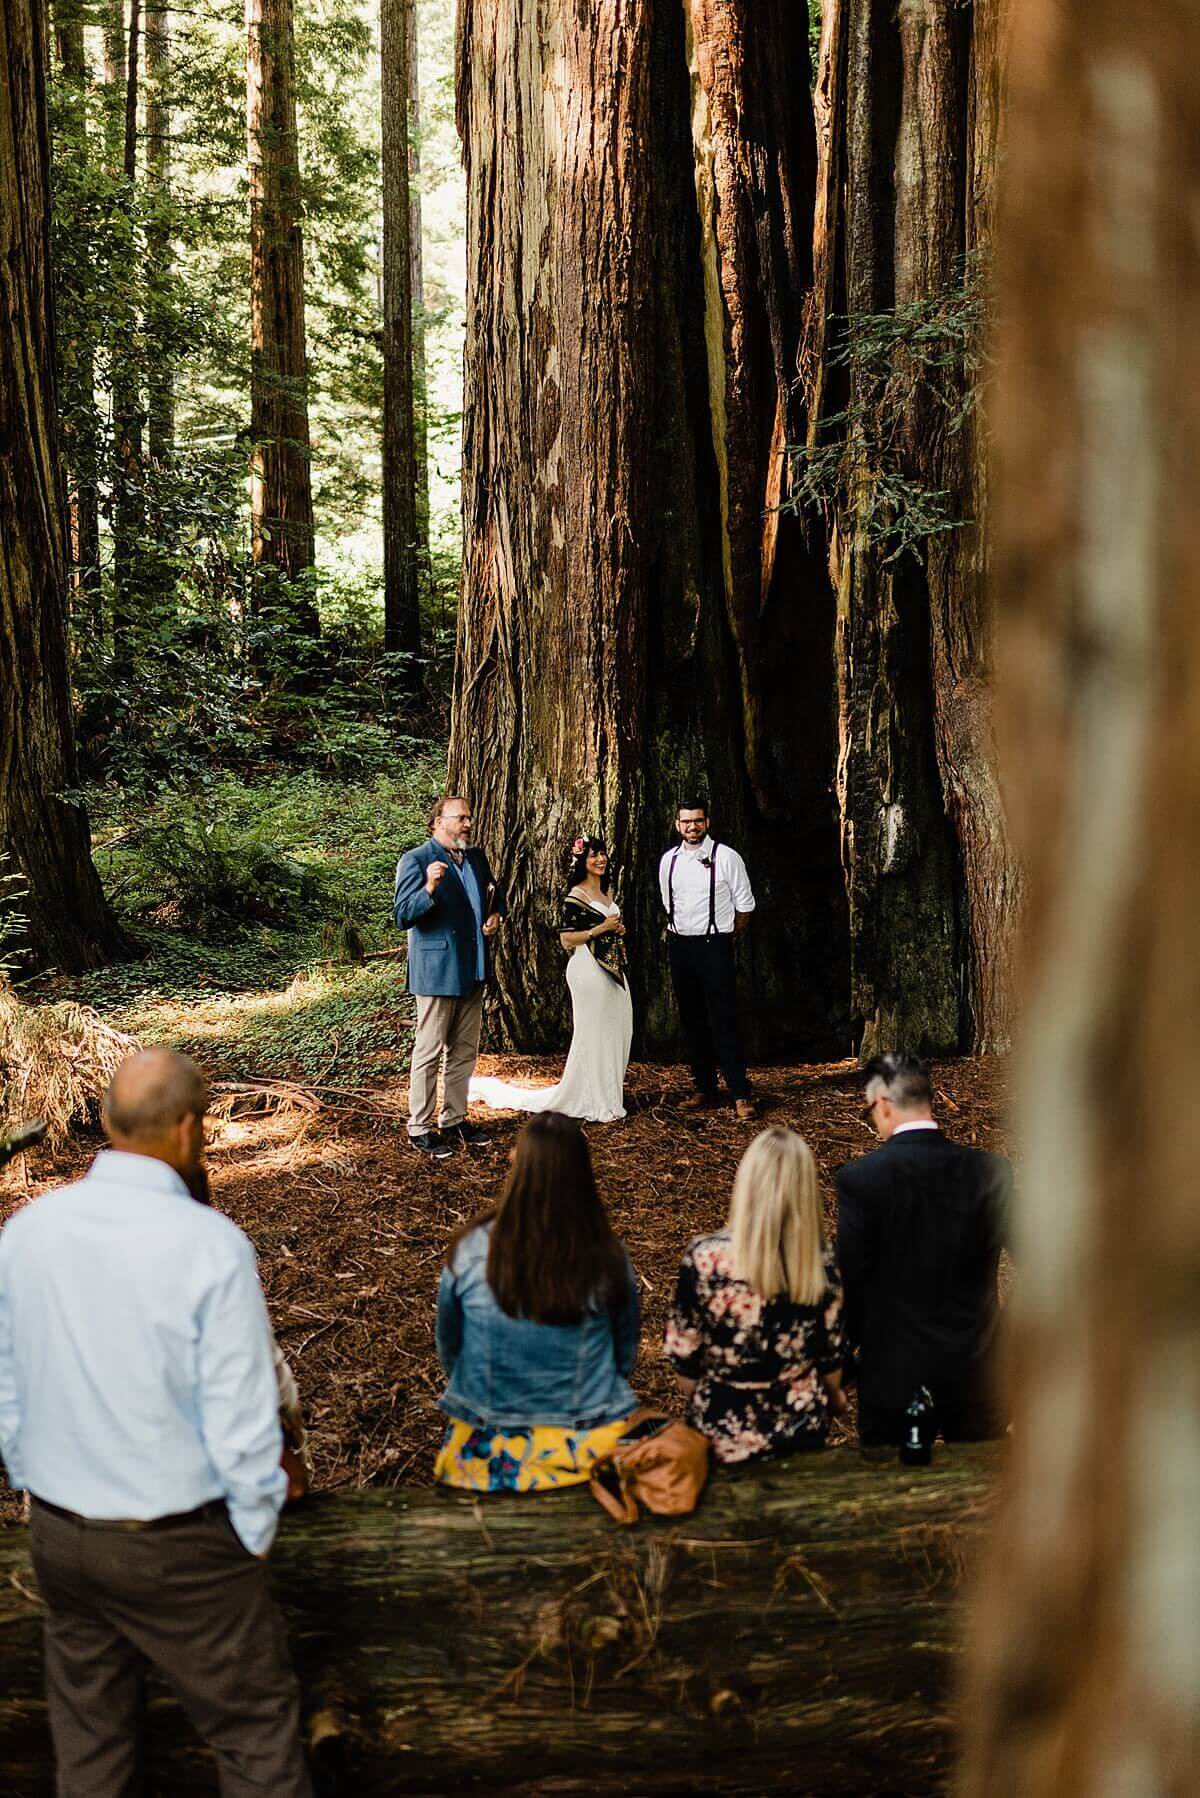 Allison-Brooks-Jedediah-Smiith-Redwoods-Adventure-Elopement-Wedding-S-Photography-Blog_0017.jpg